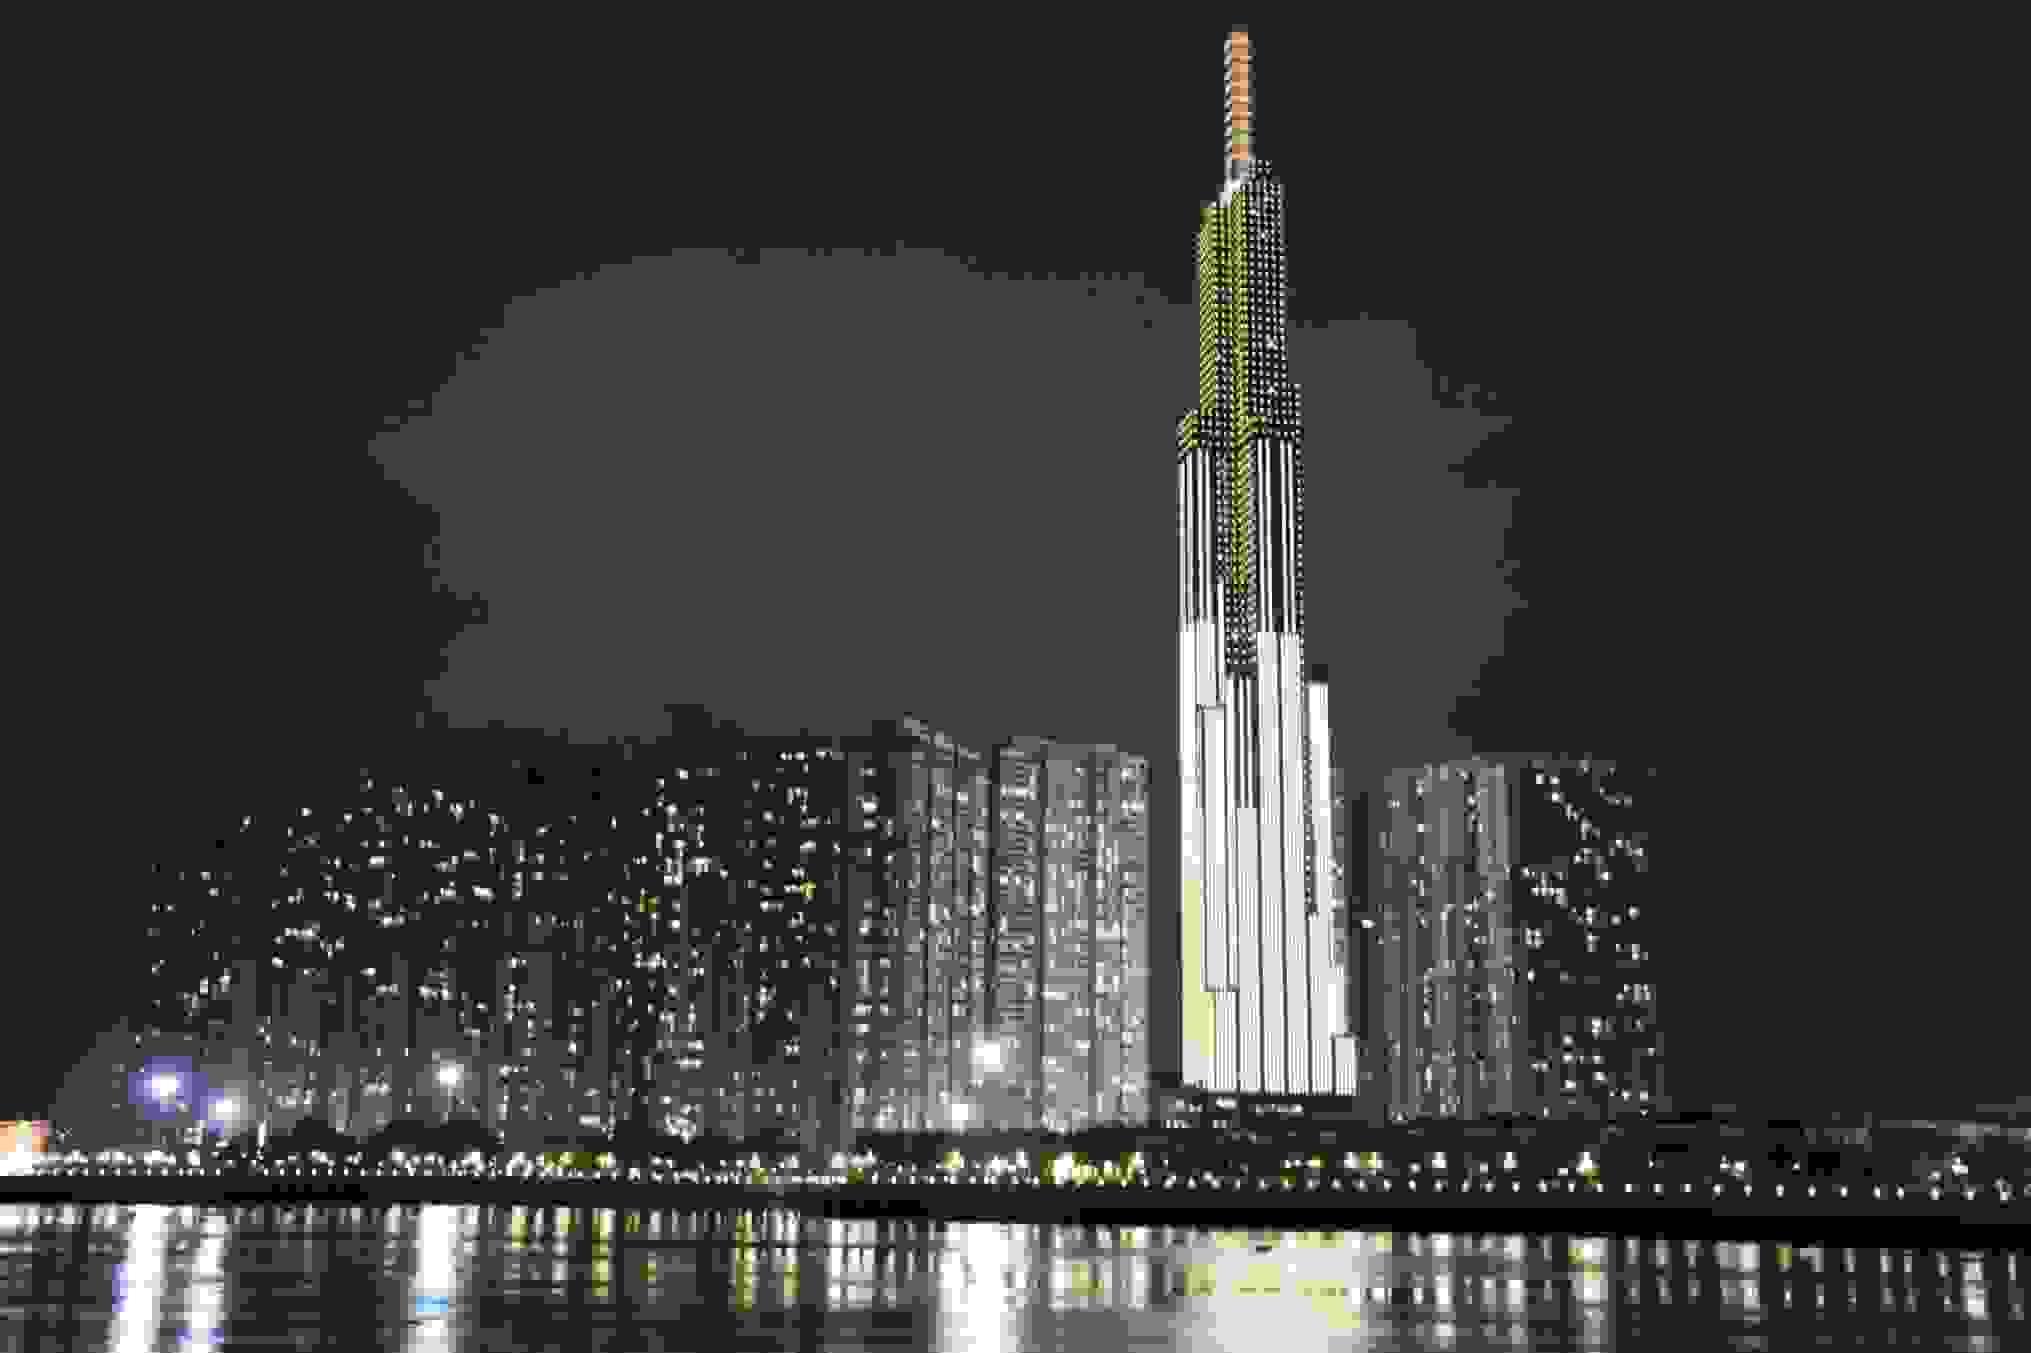 Southeast Asia's tallest tower, Landmark 81 in Vietnam